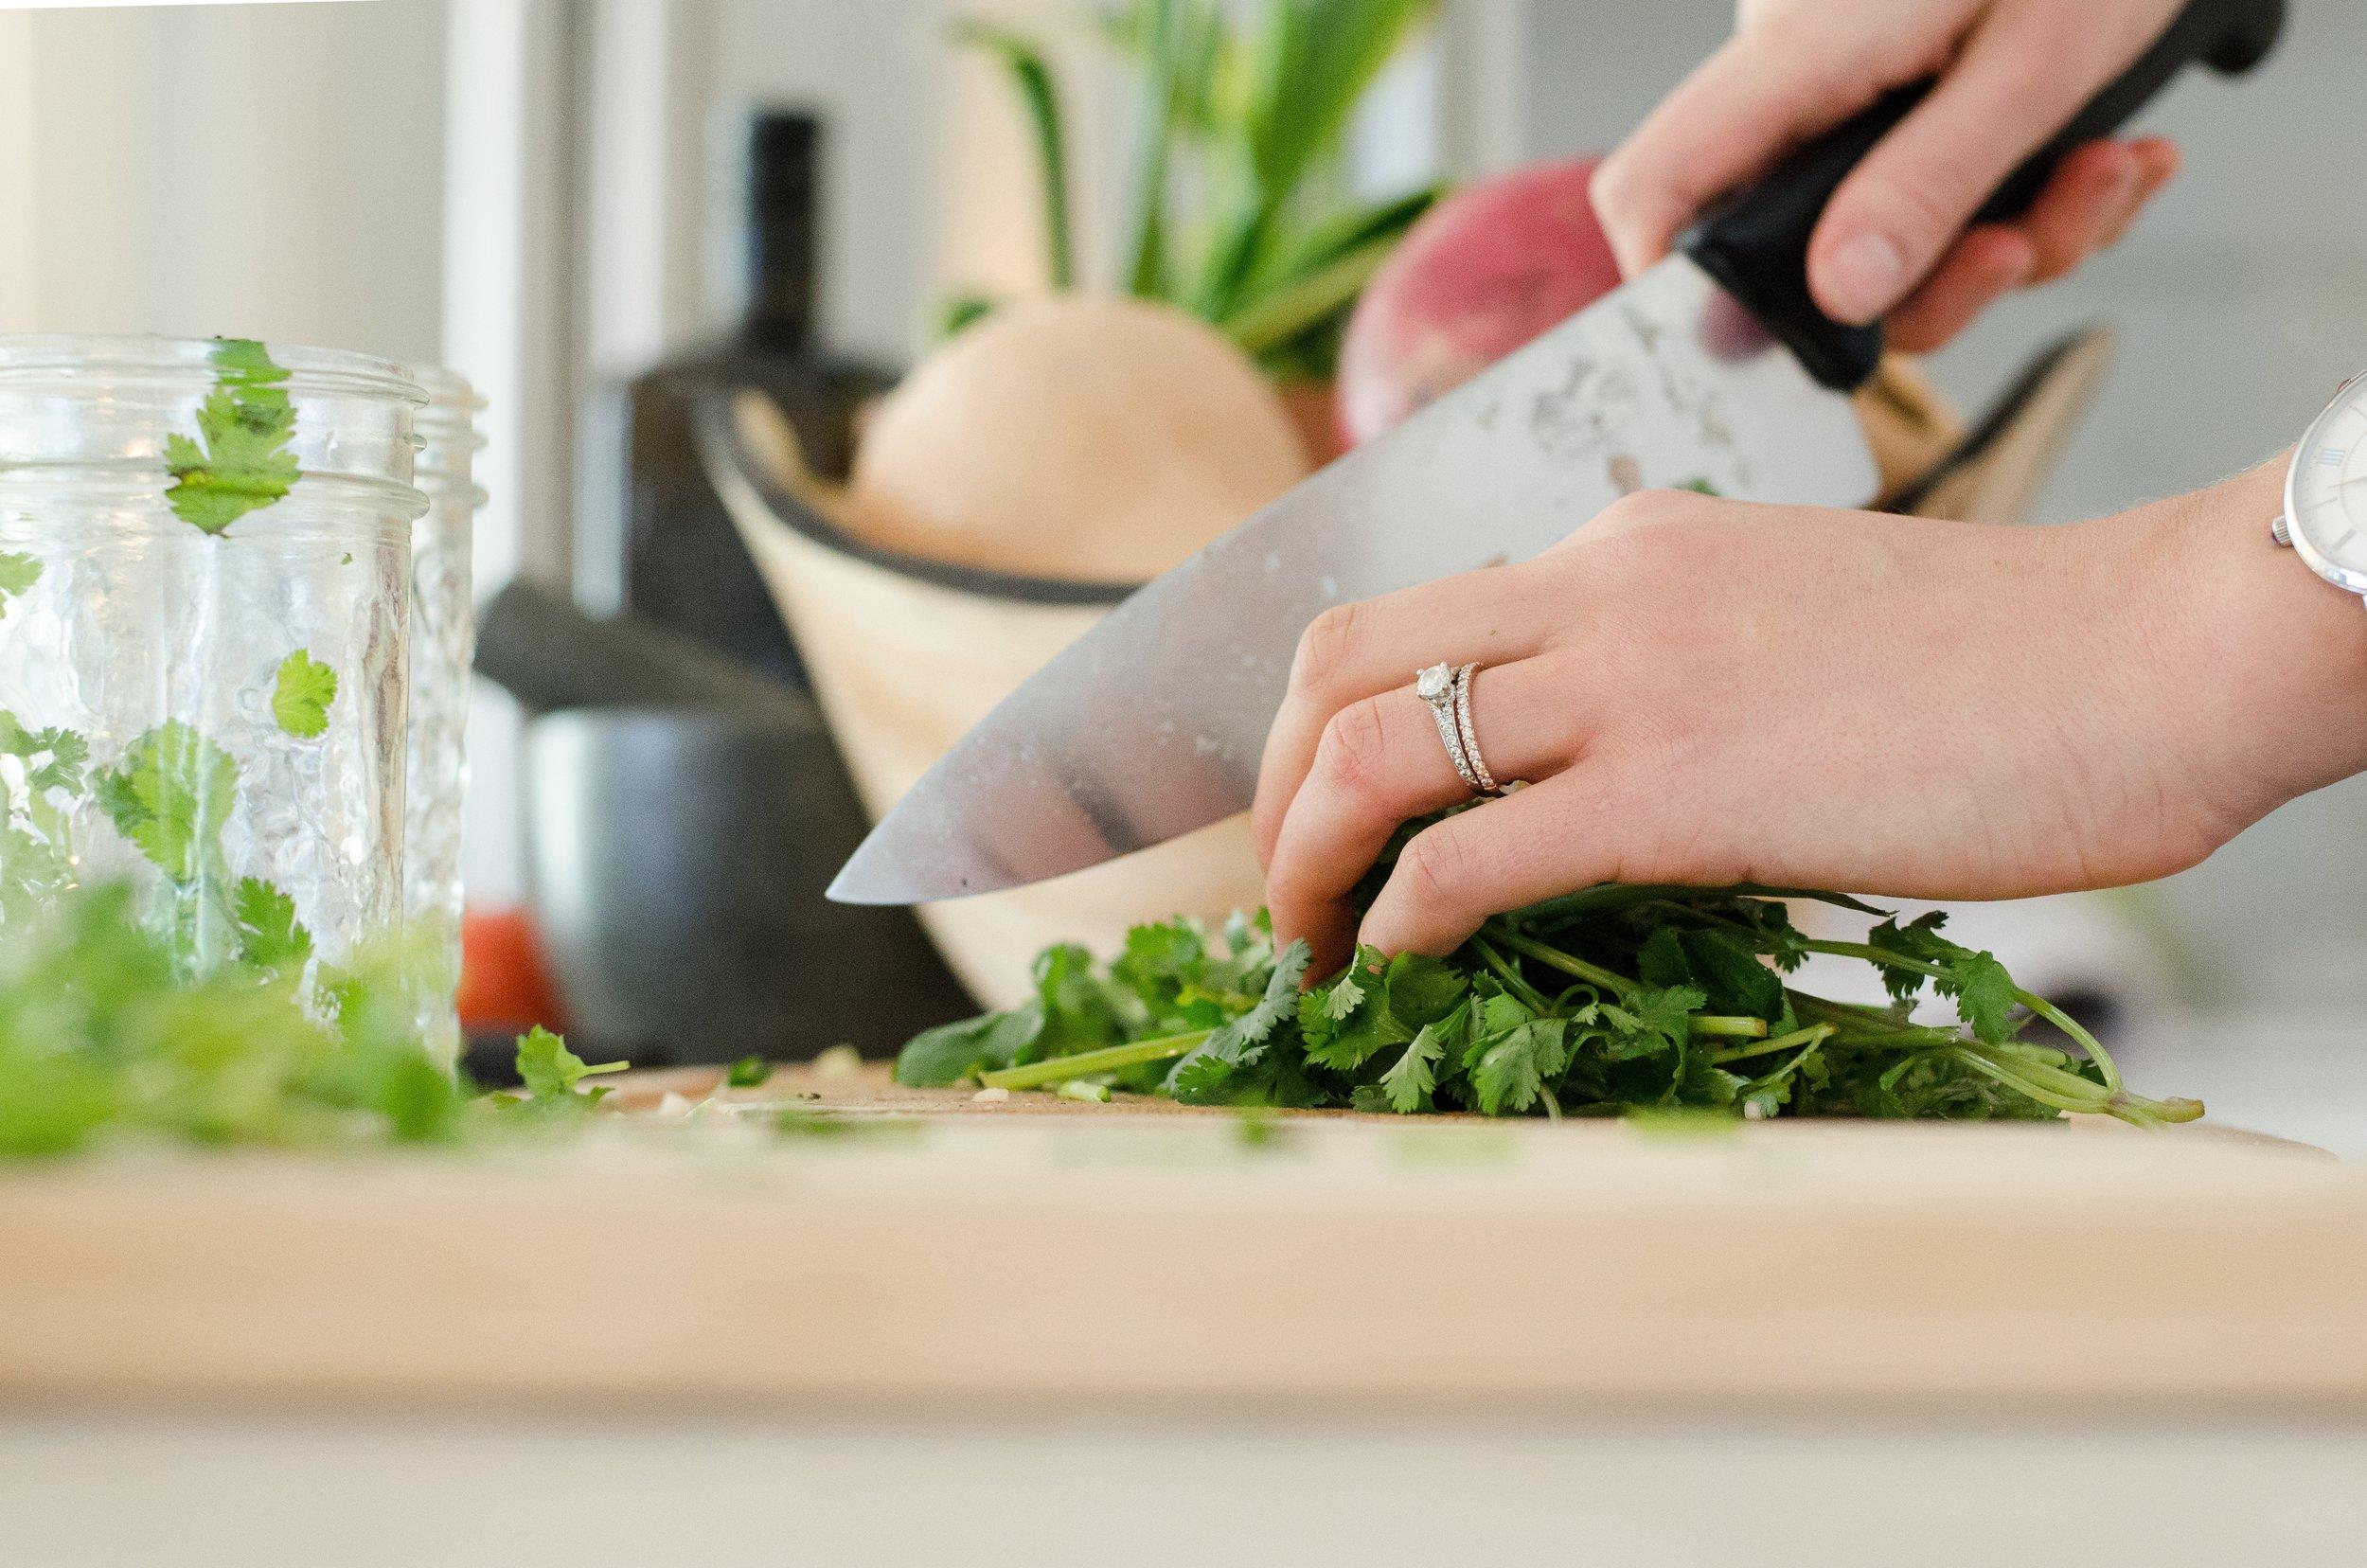 Chopping veggies alyson-mcphee-499812-unsplash.jpg